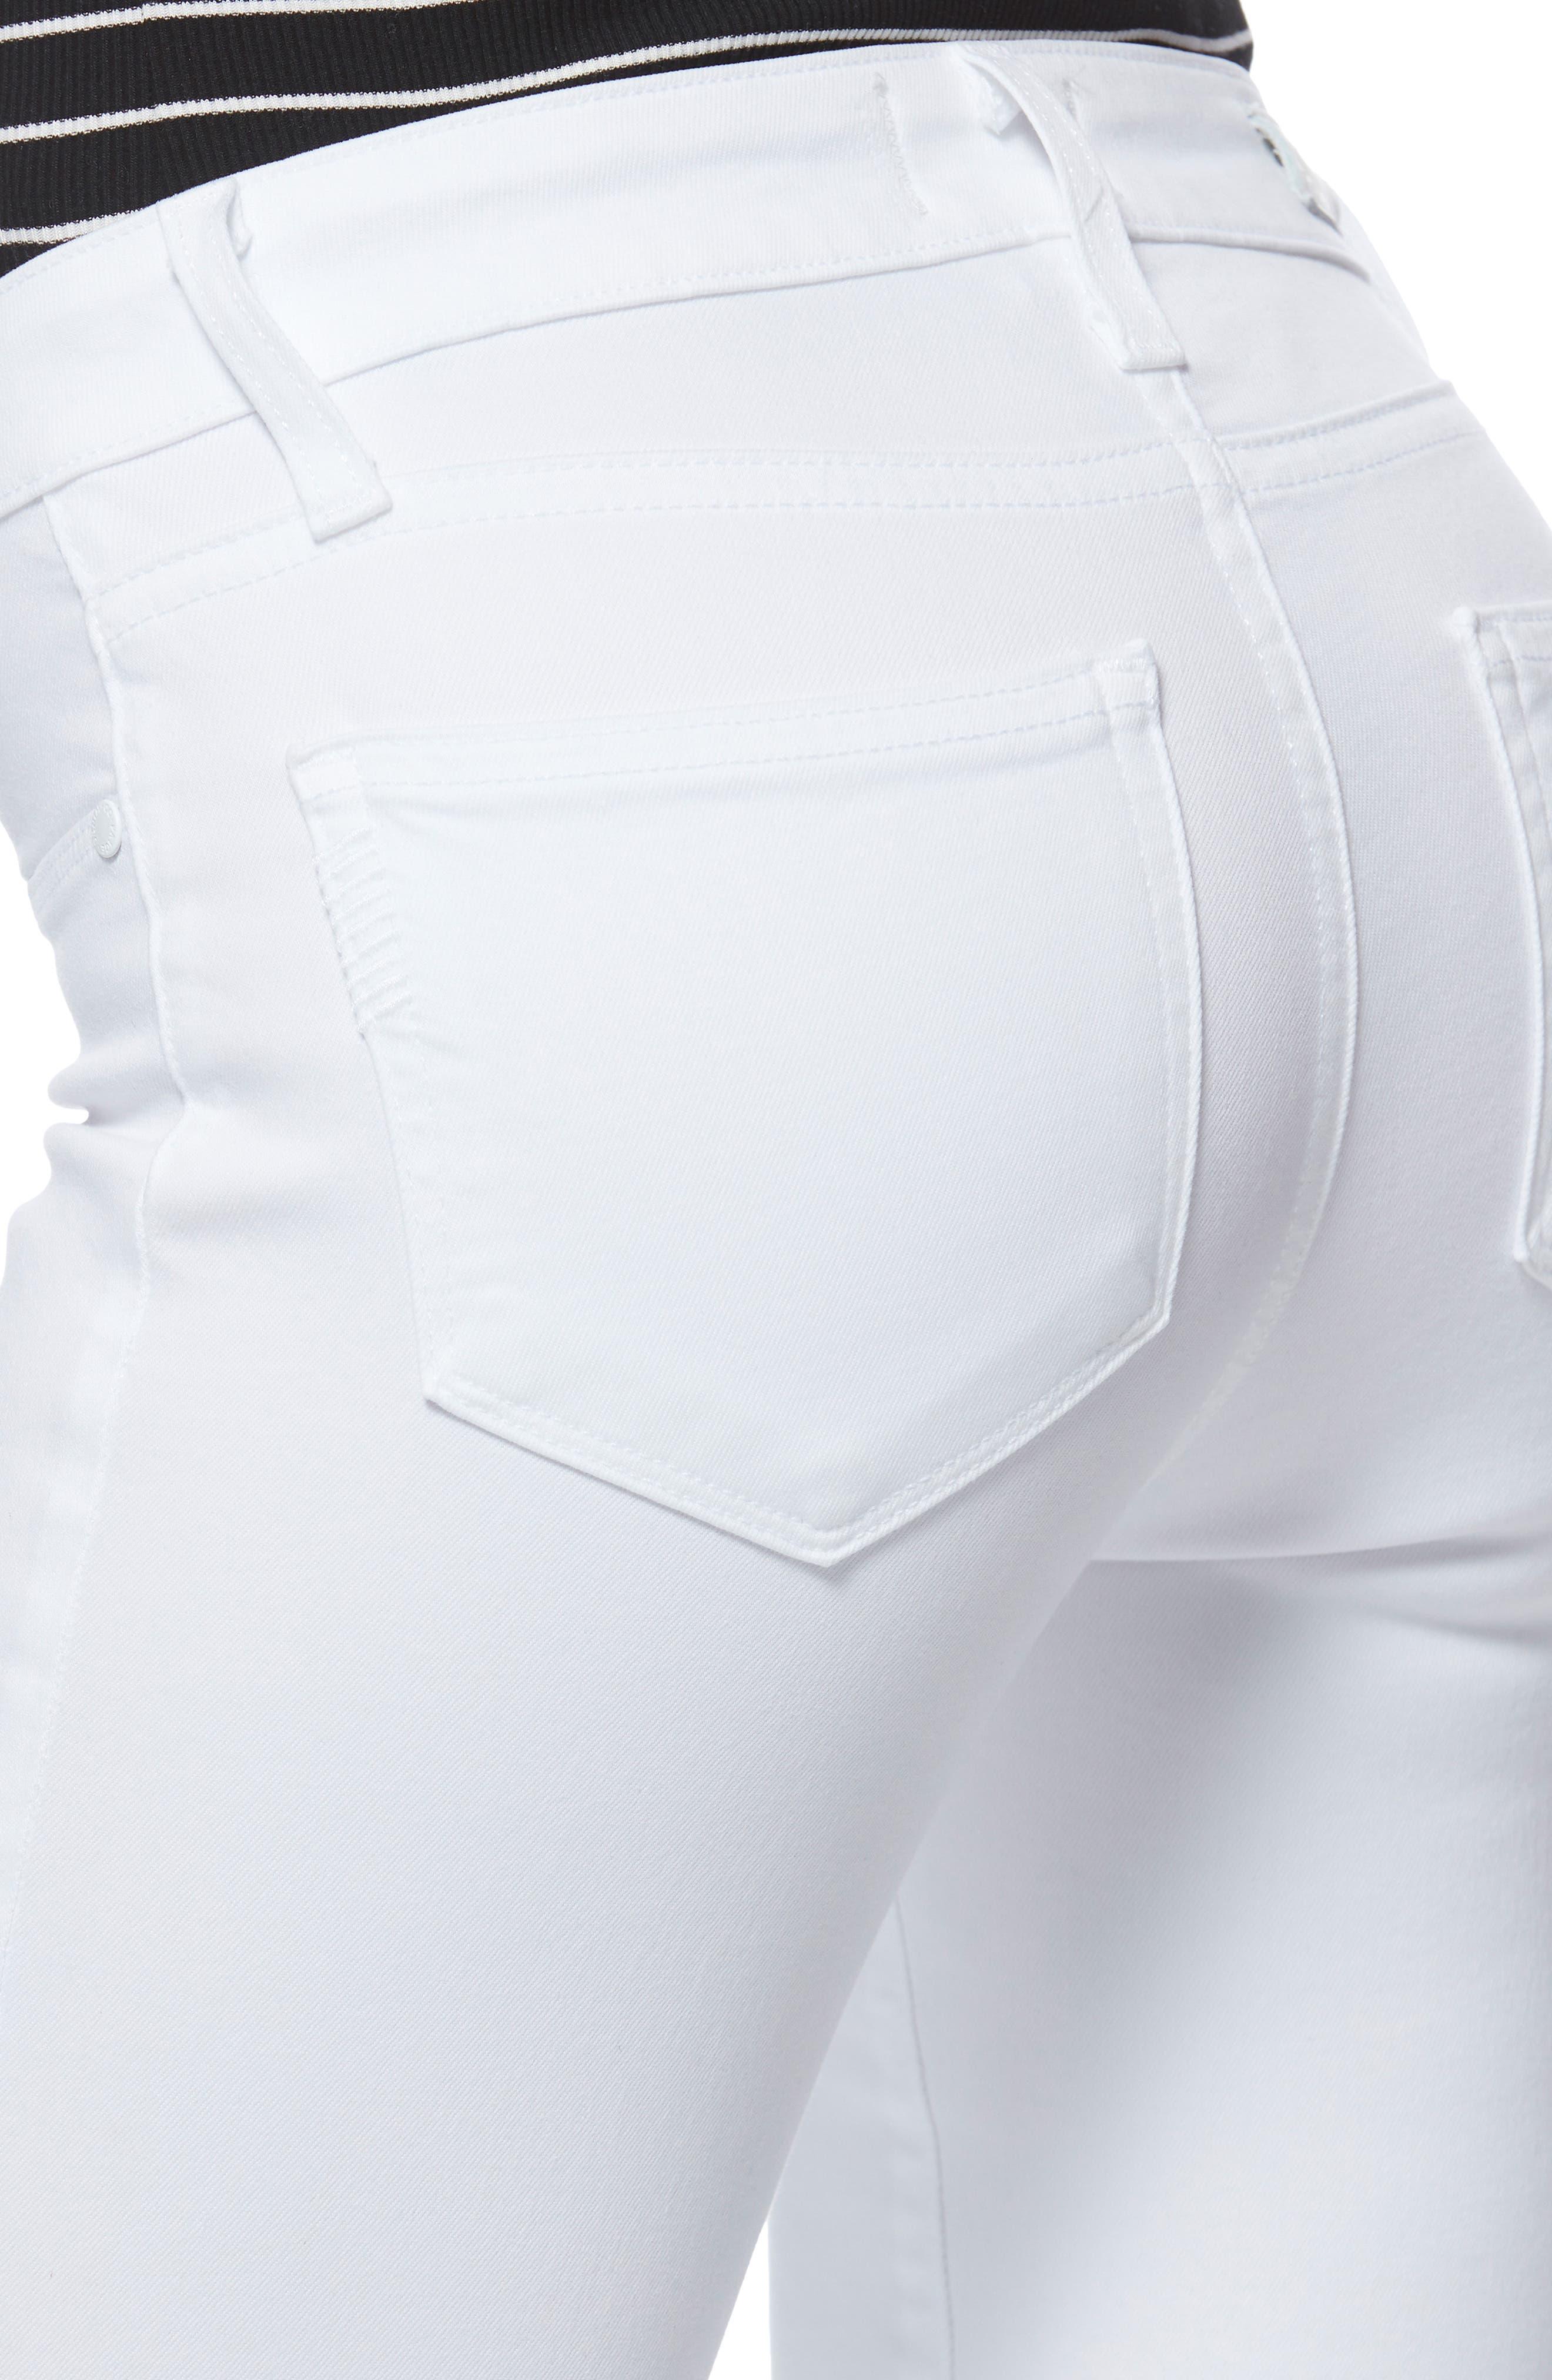 PAIGE,                             Verdugo Faux Pocket Crop Skinny Jeans,                             Alternate thumbnail 5, color,                             VIVID WHITE